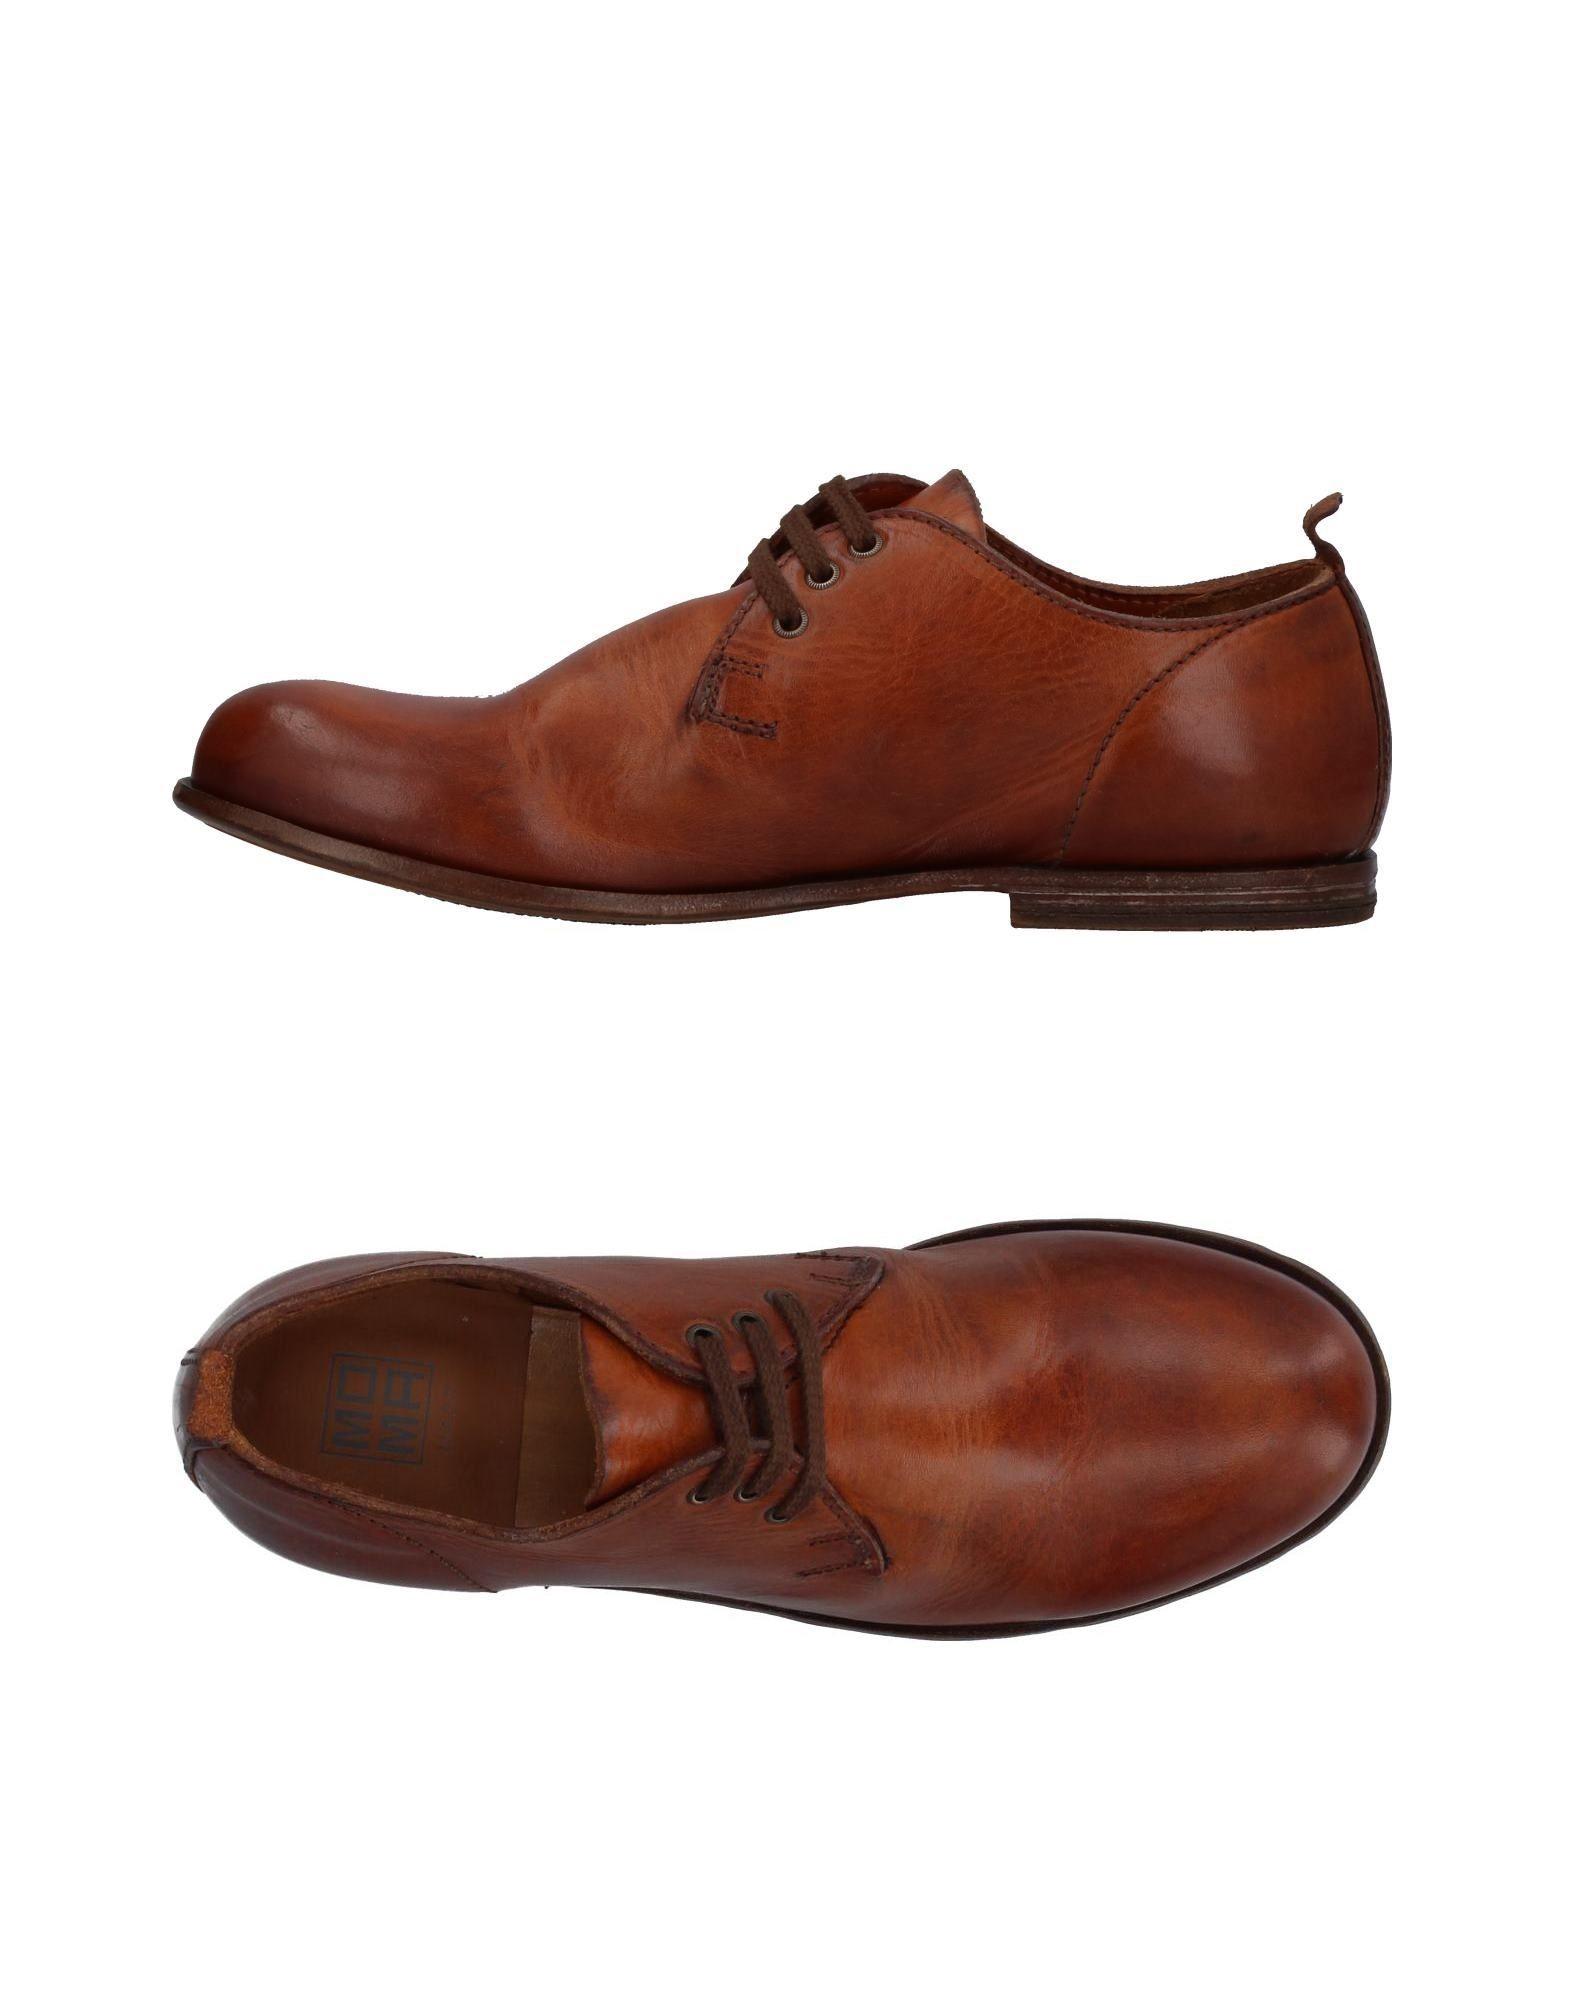 Moma Schnürschuhe Schnürschuhe Moma Damen  11411826FA Heiße Schuhe 506dd7